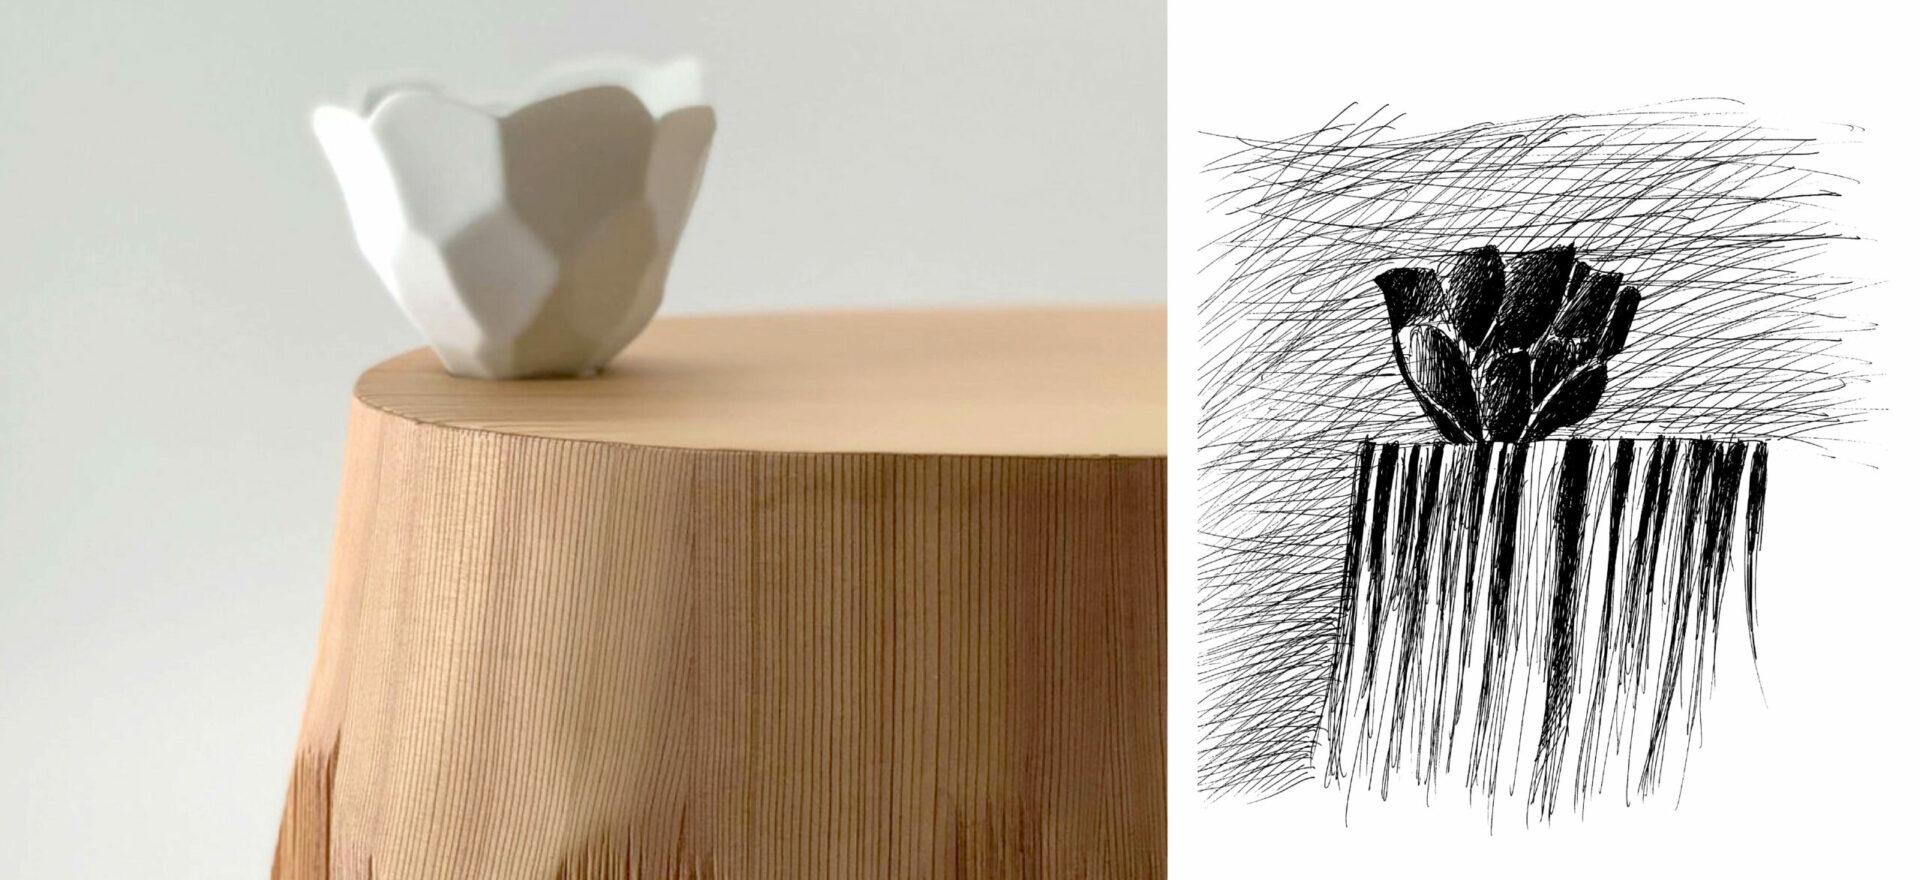 HOPE_HANDS ON DESIGN_MARIO TRIMARCHI3